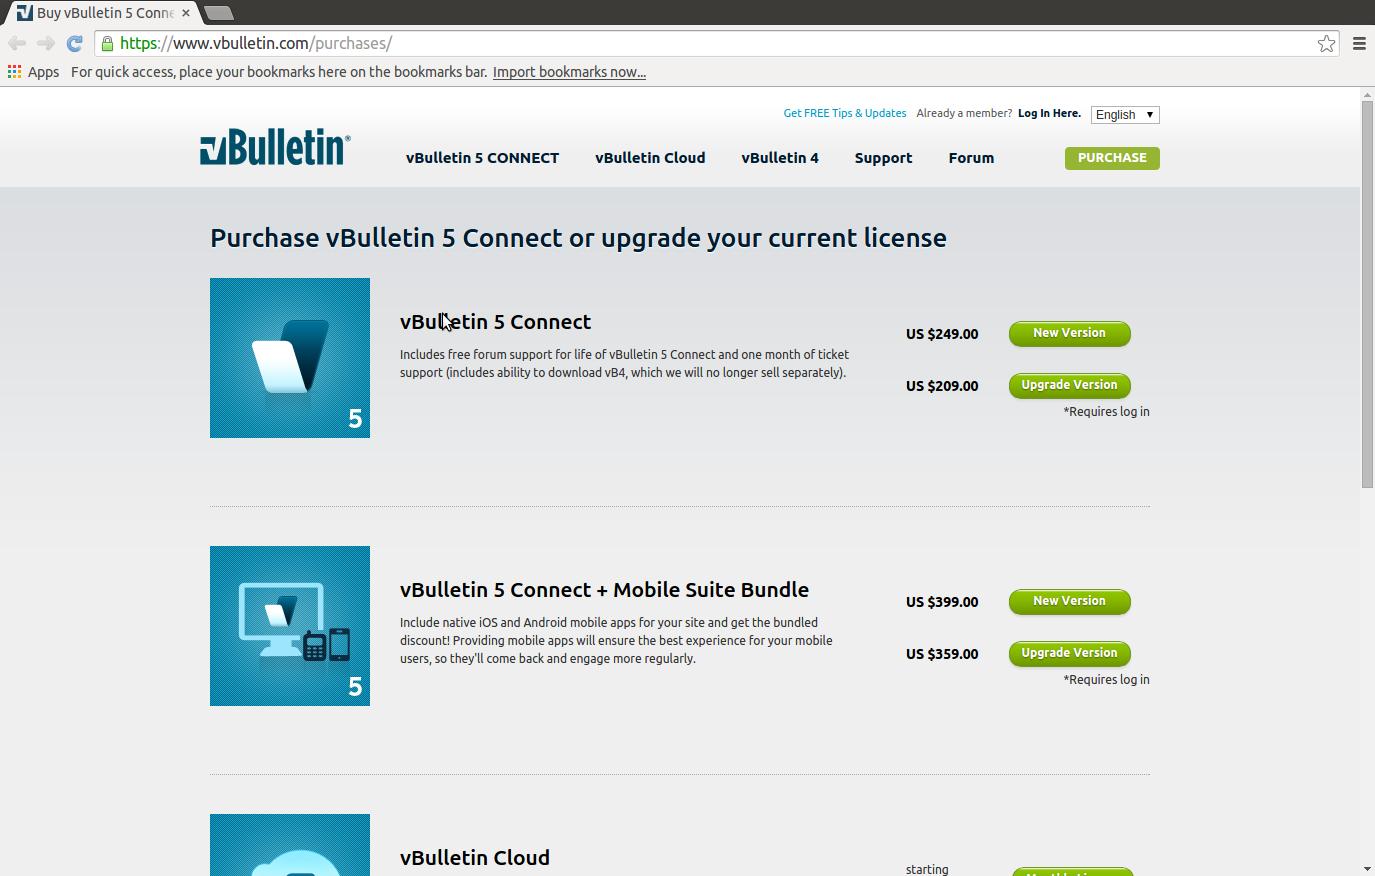 CVE-2014-9469 vBulletin XSS (Cross-Site Scripting) Web Security 0Day